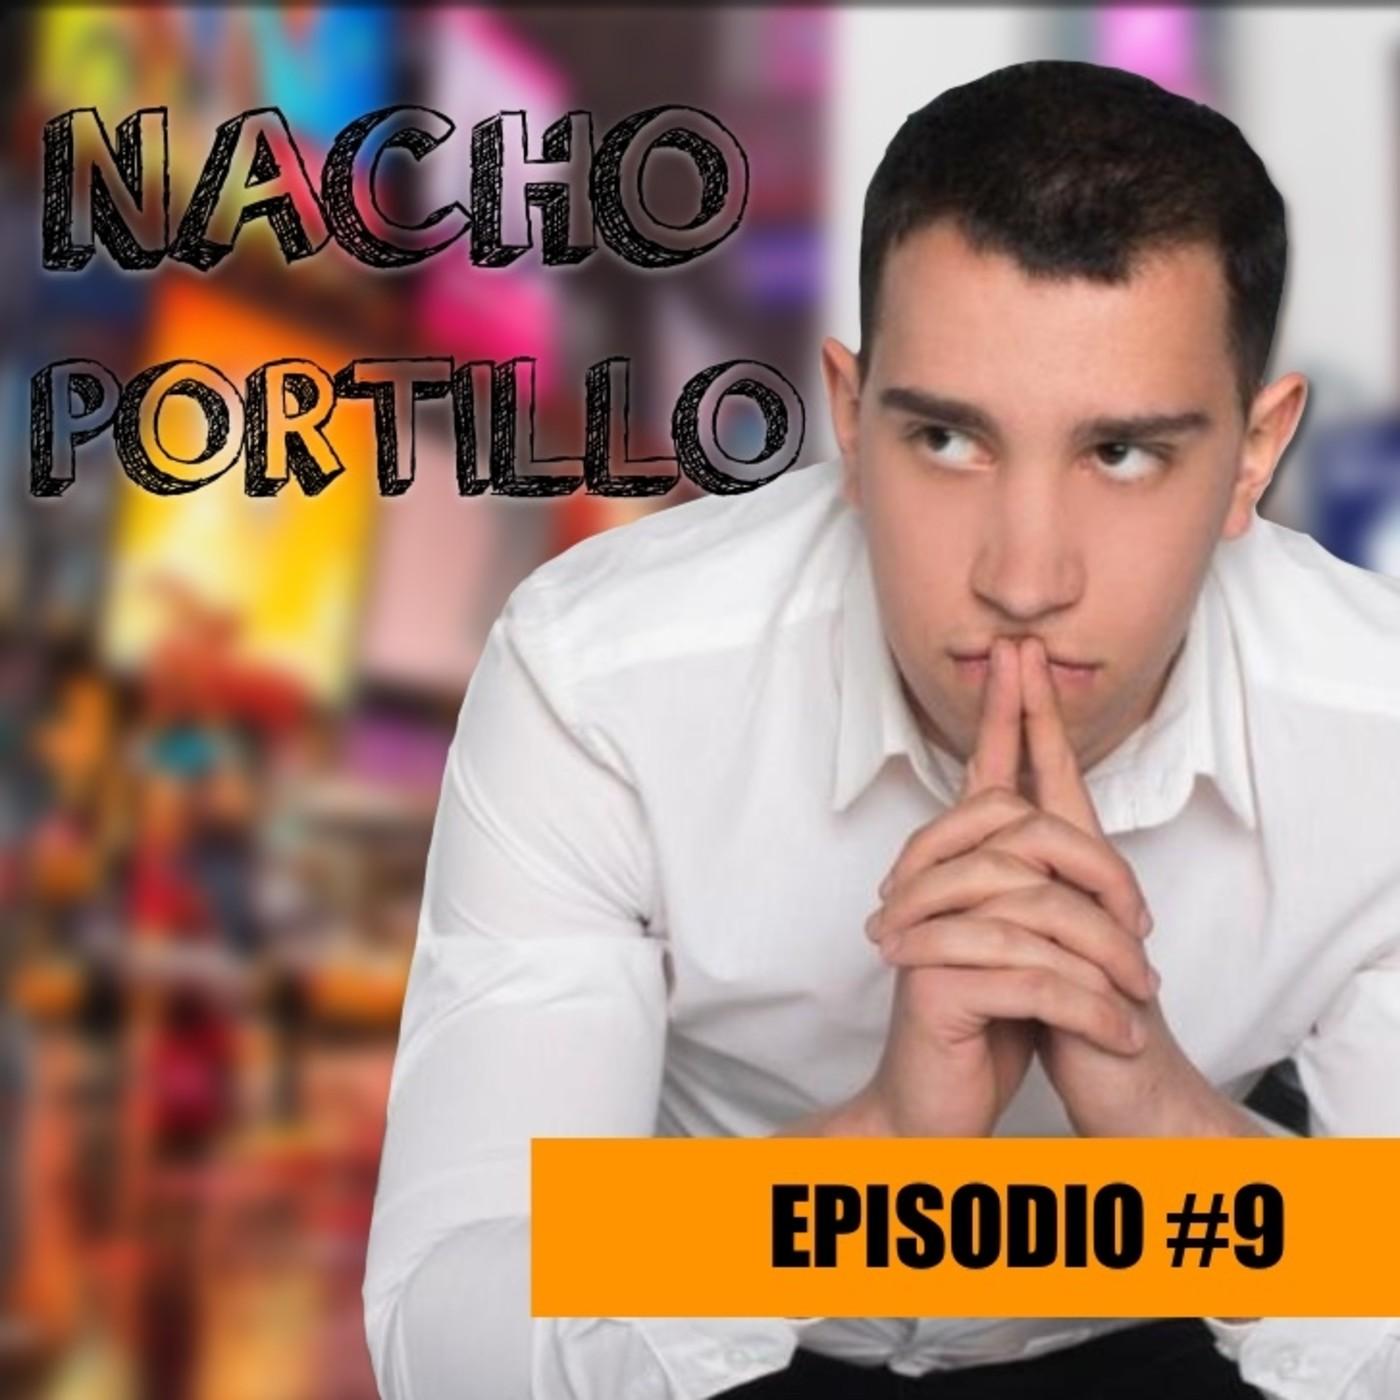 Episodio 9 con Nacho Portillo. Emprendimiento. Kinnetick Media. Inicios AudioFit